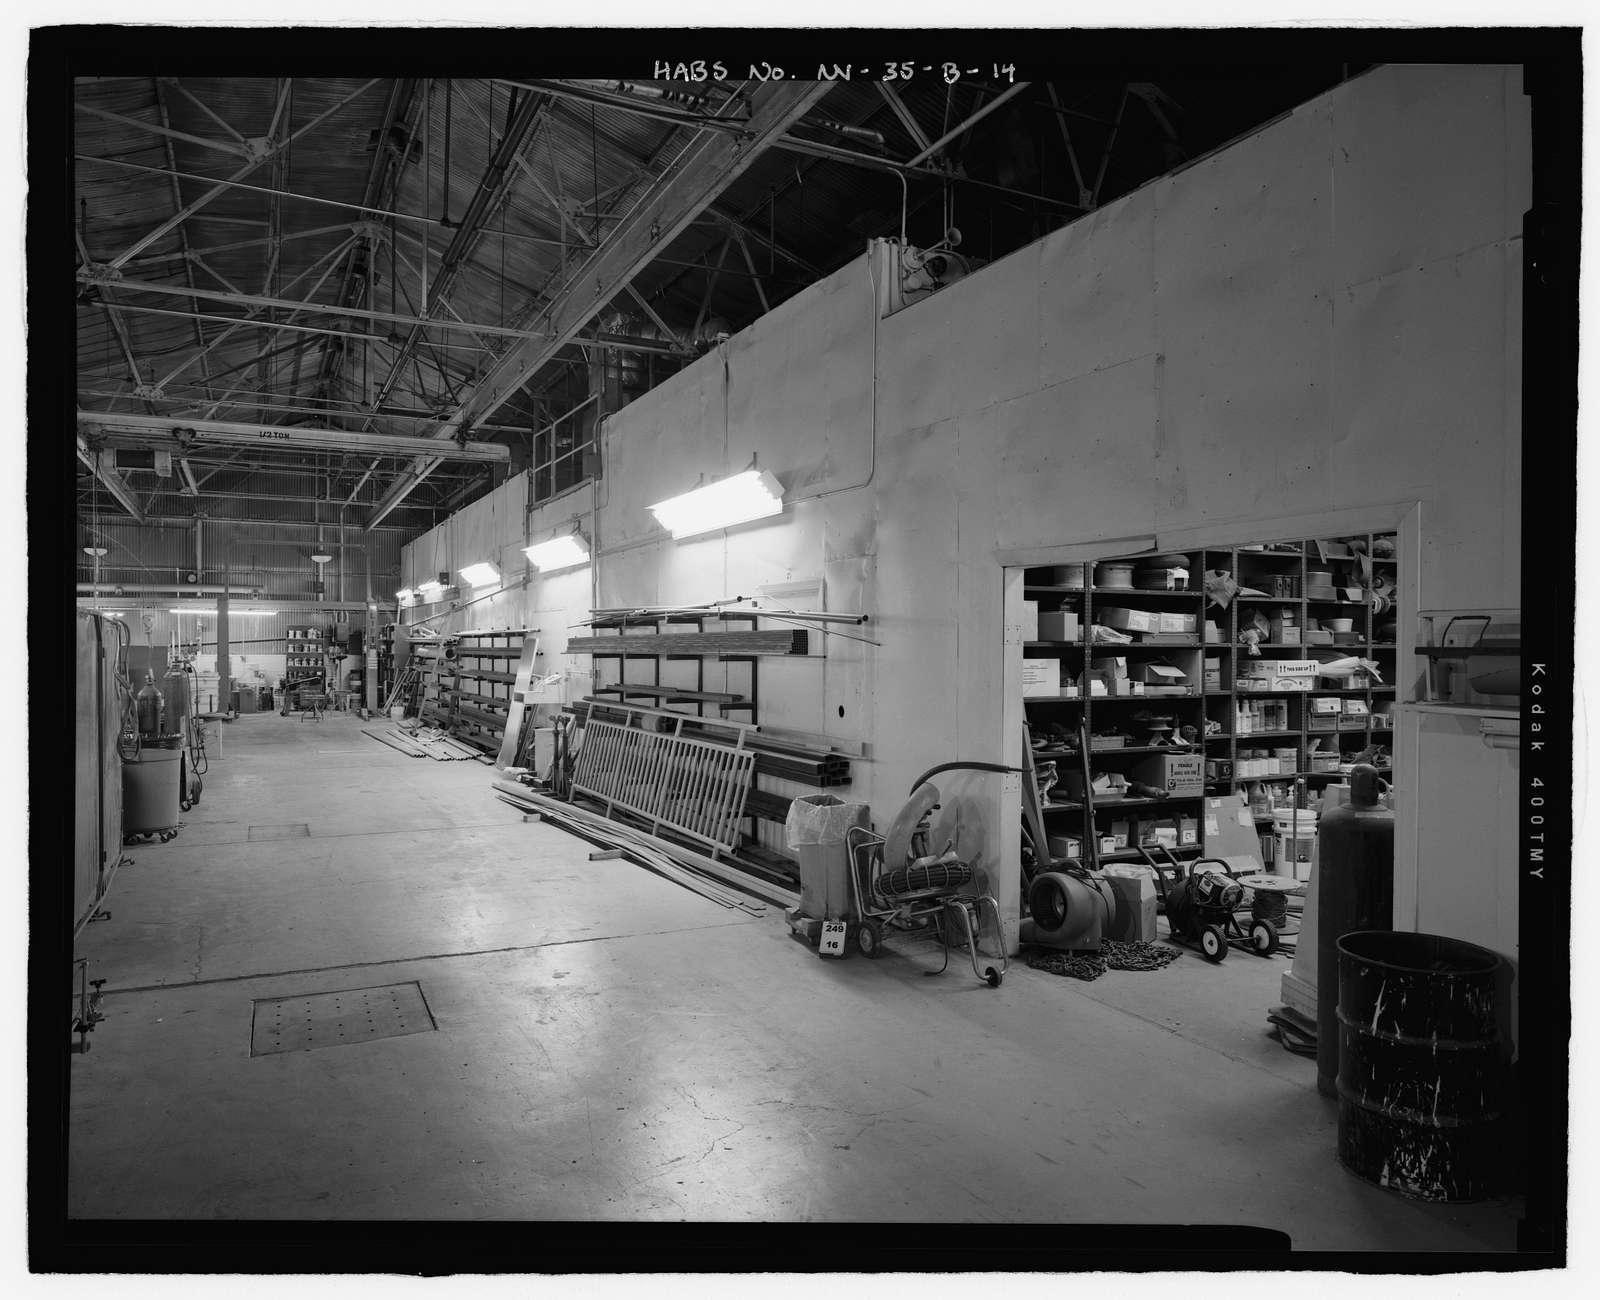 Bureau of Mines Metallurgical Research Laboratory, Original Building, Date Street north of U.S. Highway 93, Boulder City, Clark County, NV